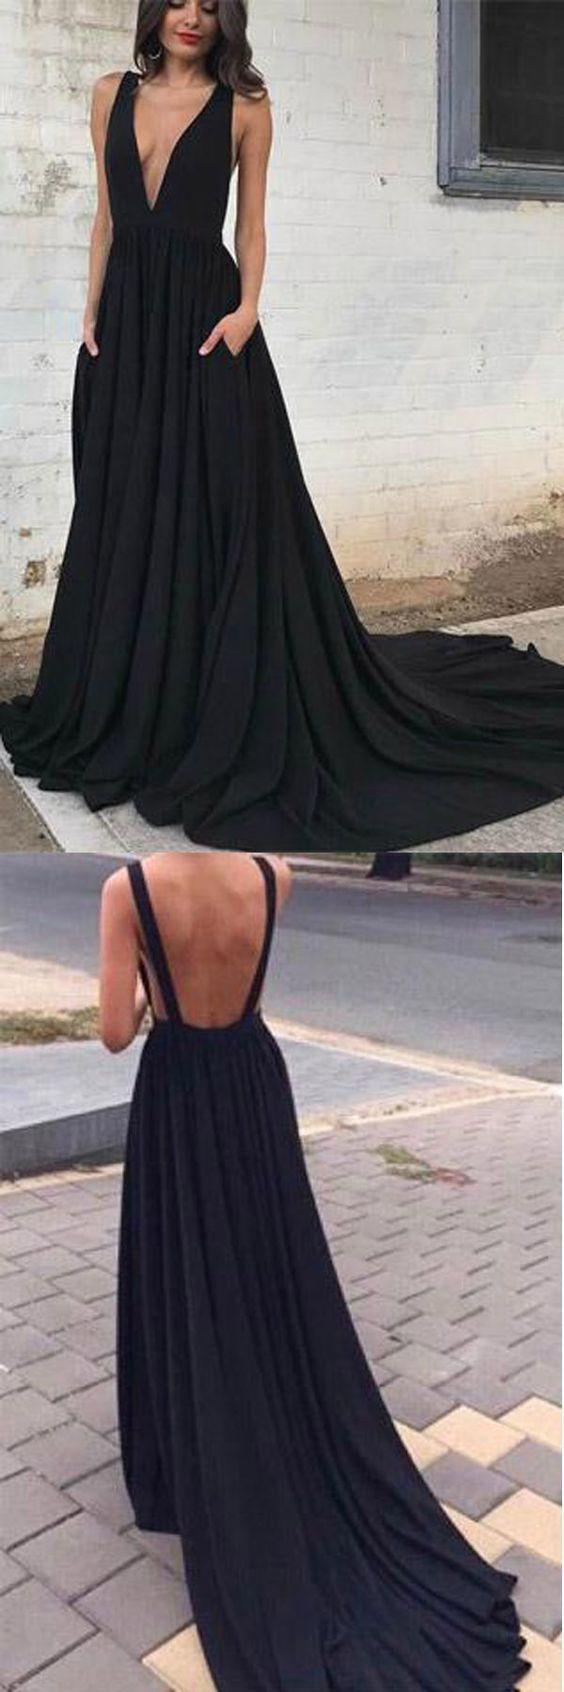 Simple black chiffon backless deep v neck a line long prom dress